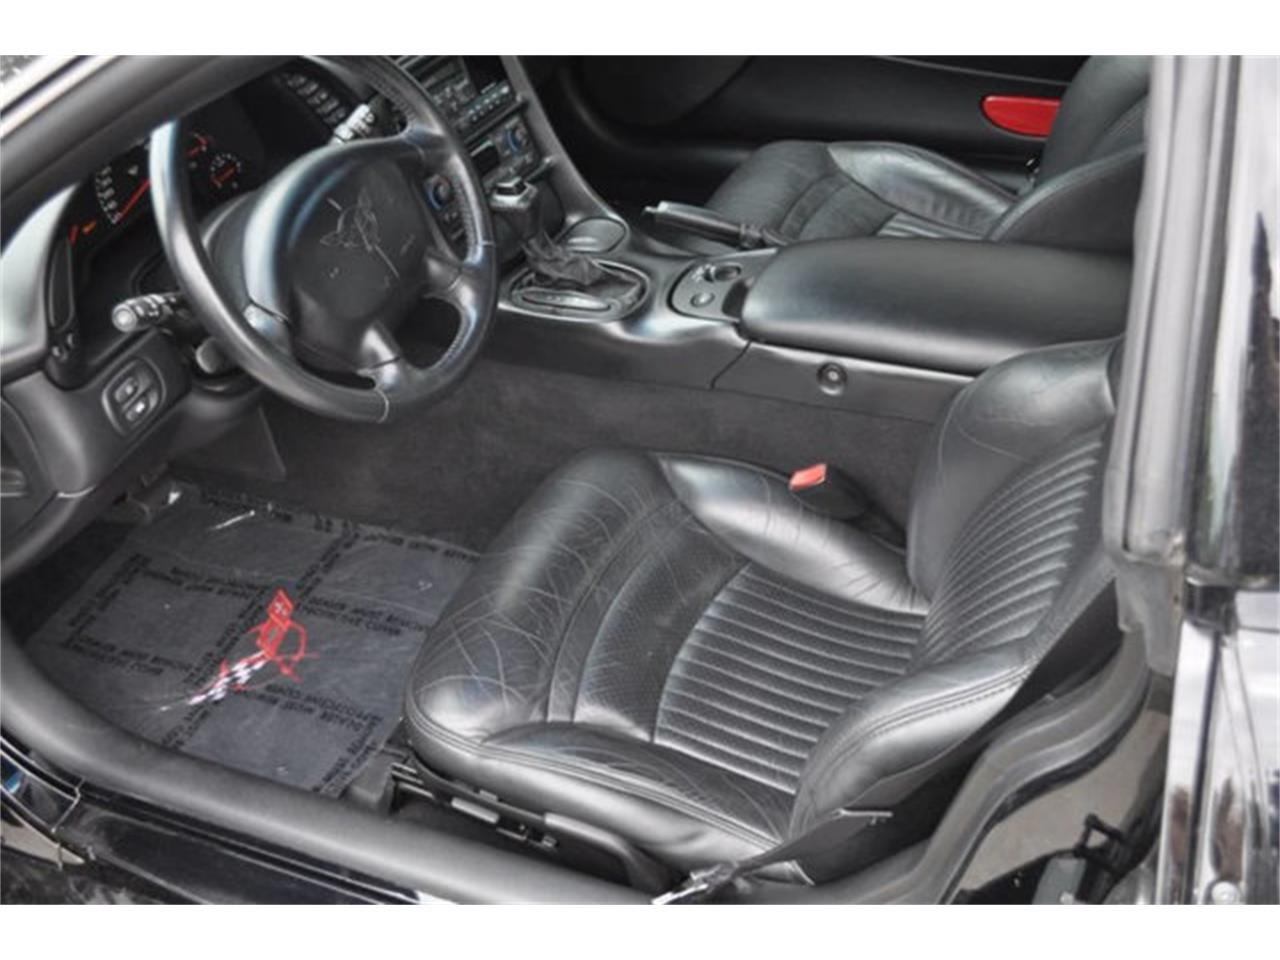 Large Picture of '97 Chevrolet Corvette - $15,999.00 - QDO3